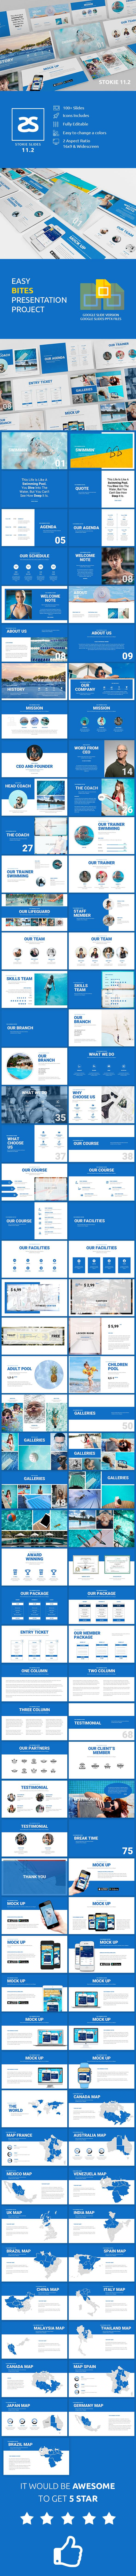 GraphicRiver Swimming Google Slide Presentation Template 11.2 21010563